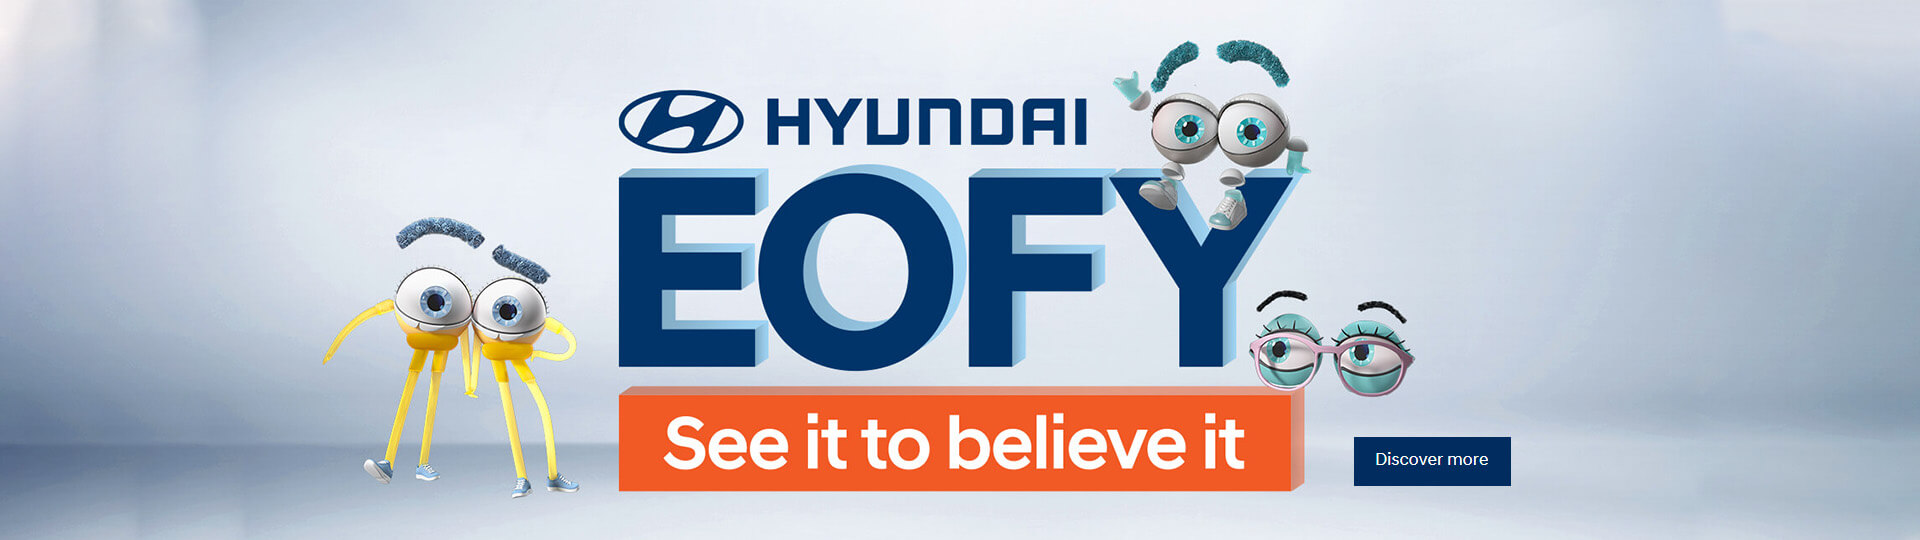 Hyundai EOFY. See it to believe it.